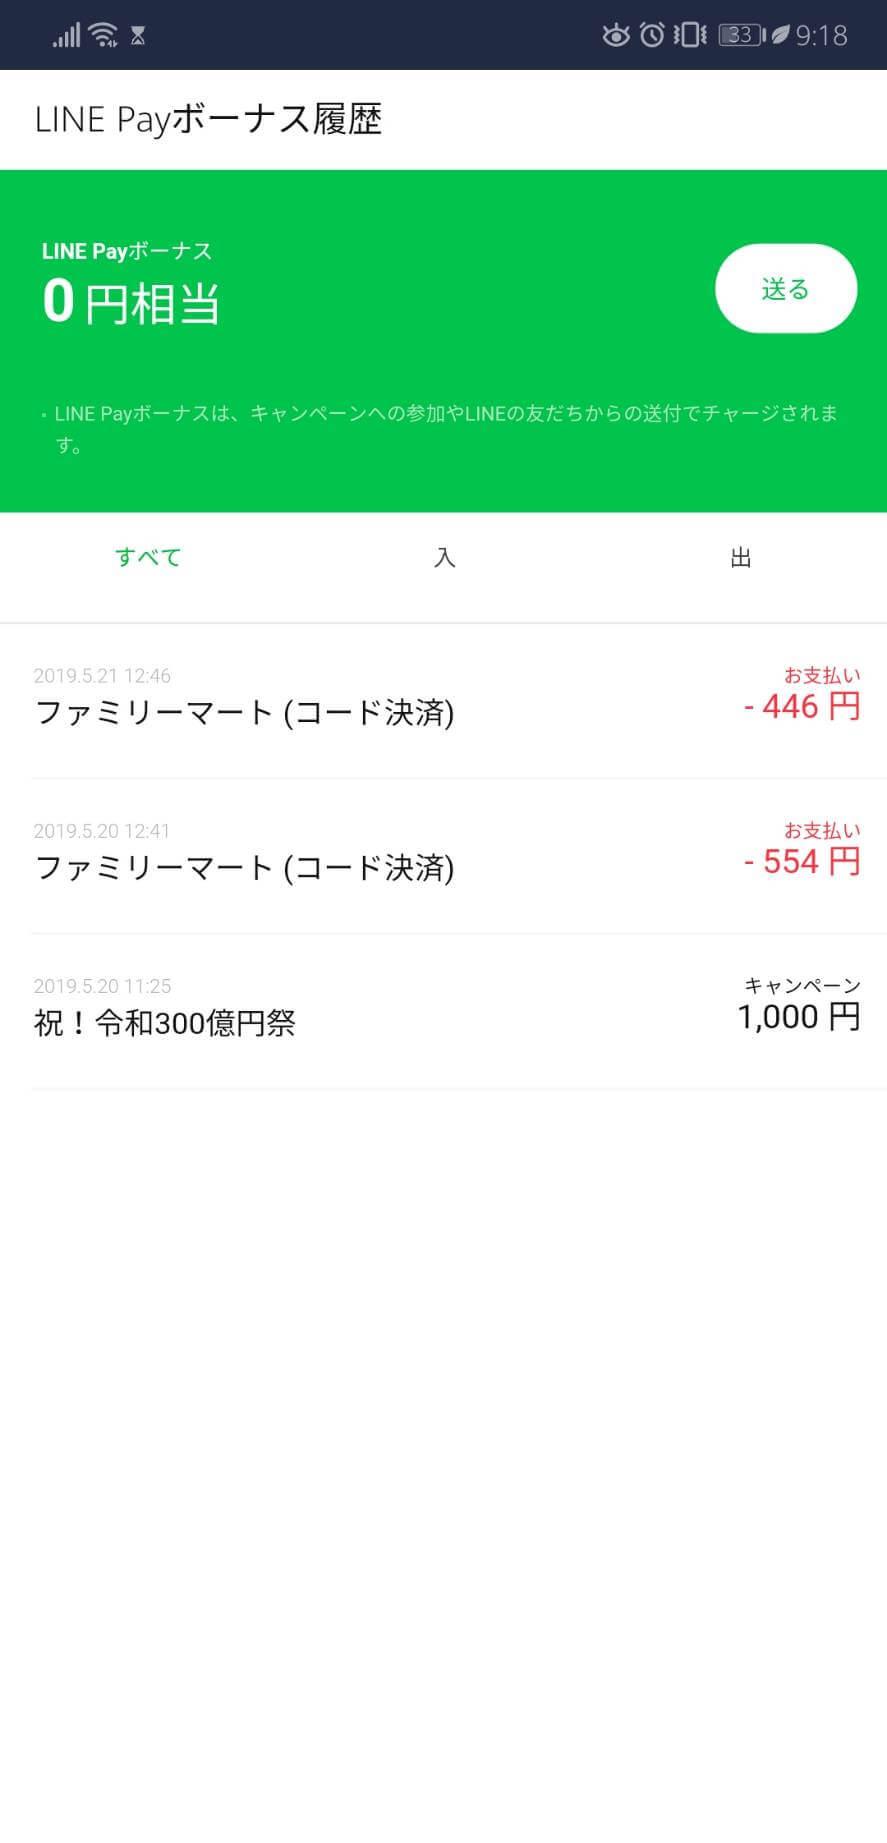 LINEPayボーナス利用履歴